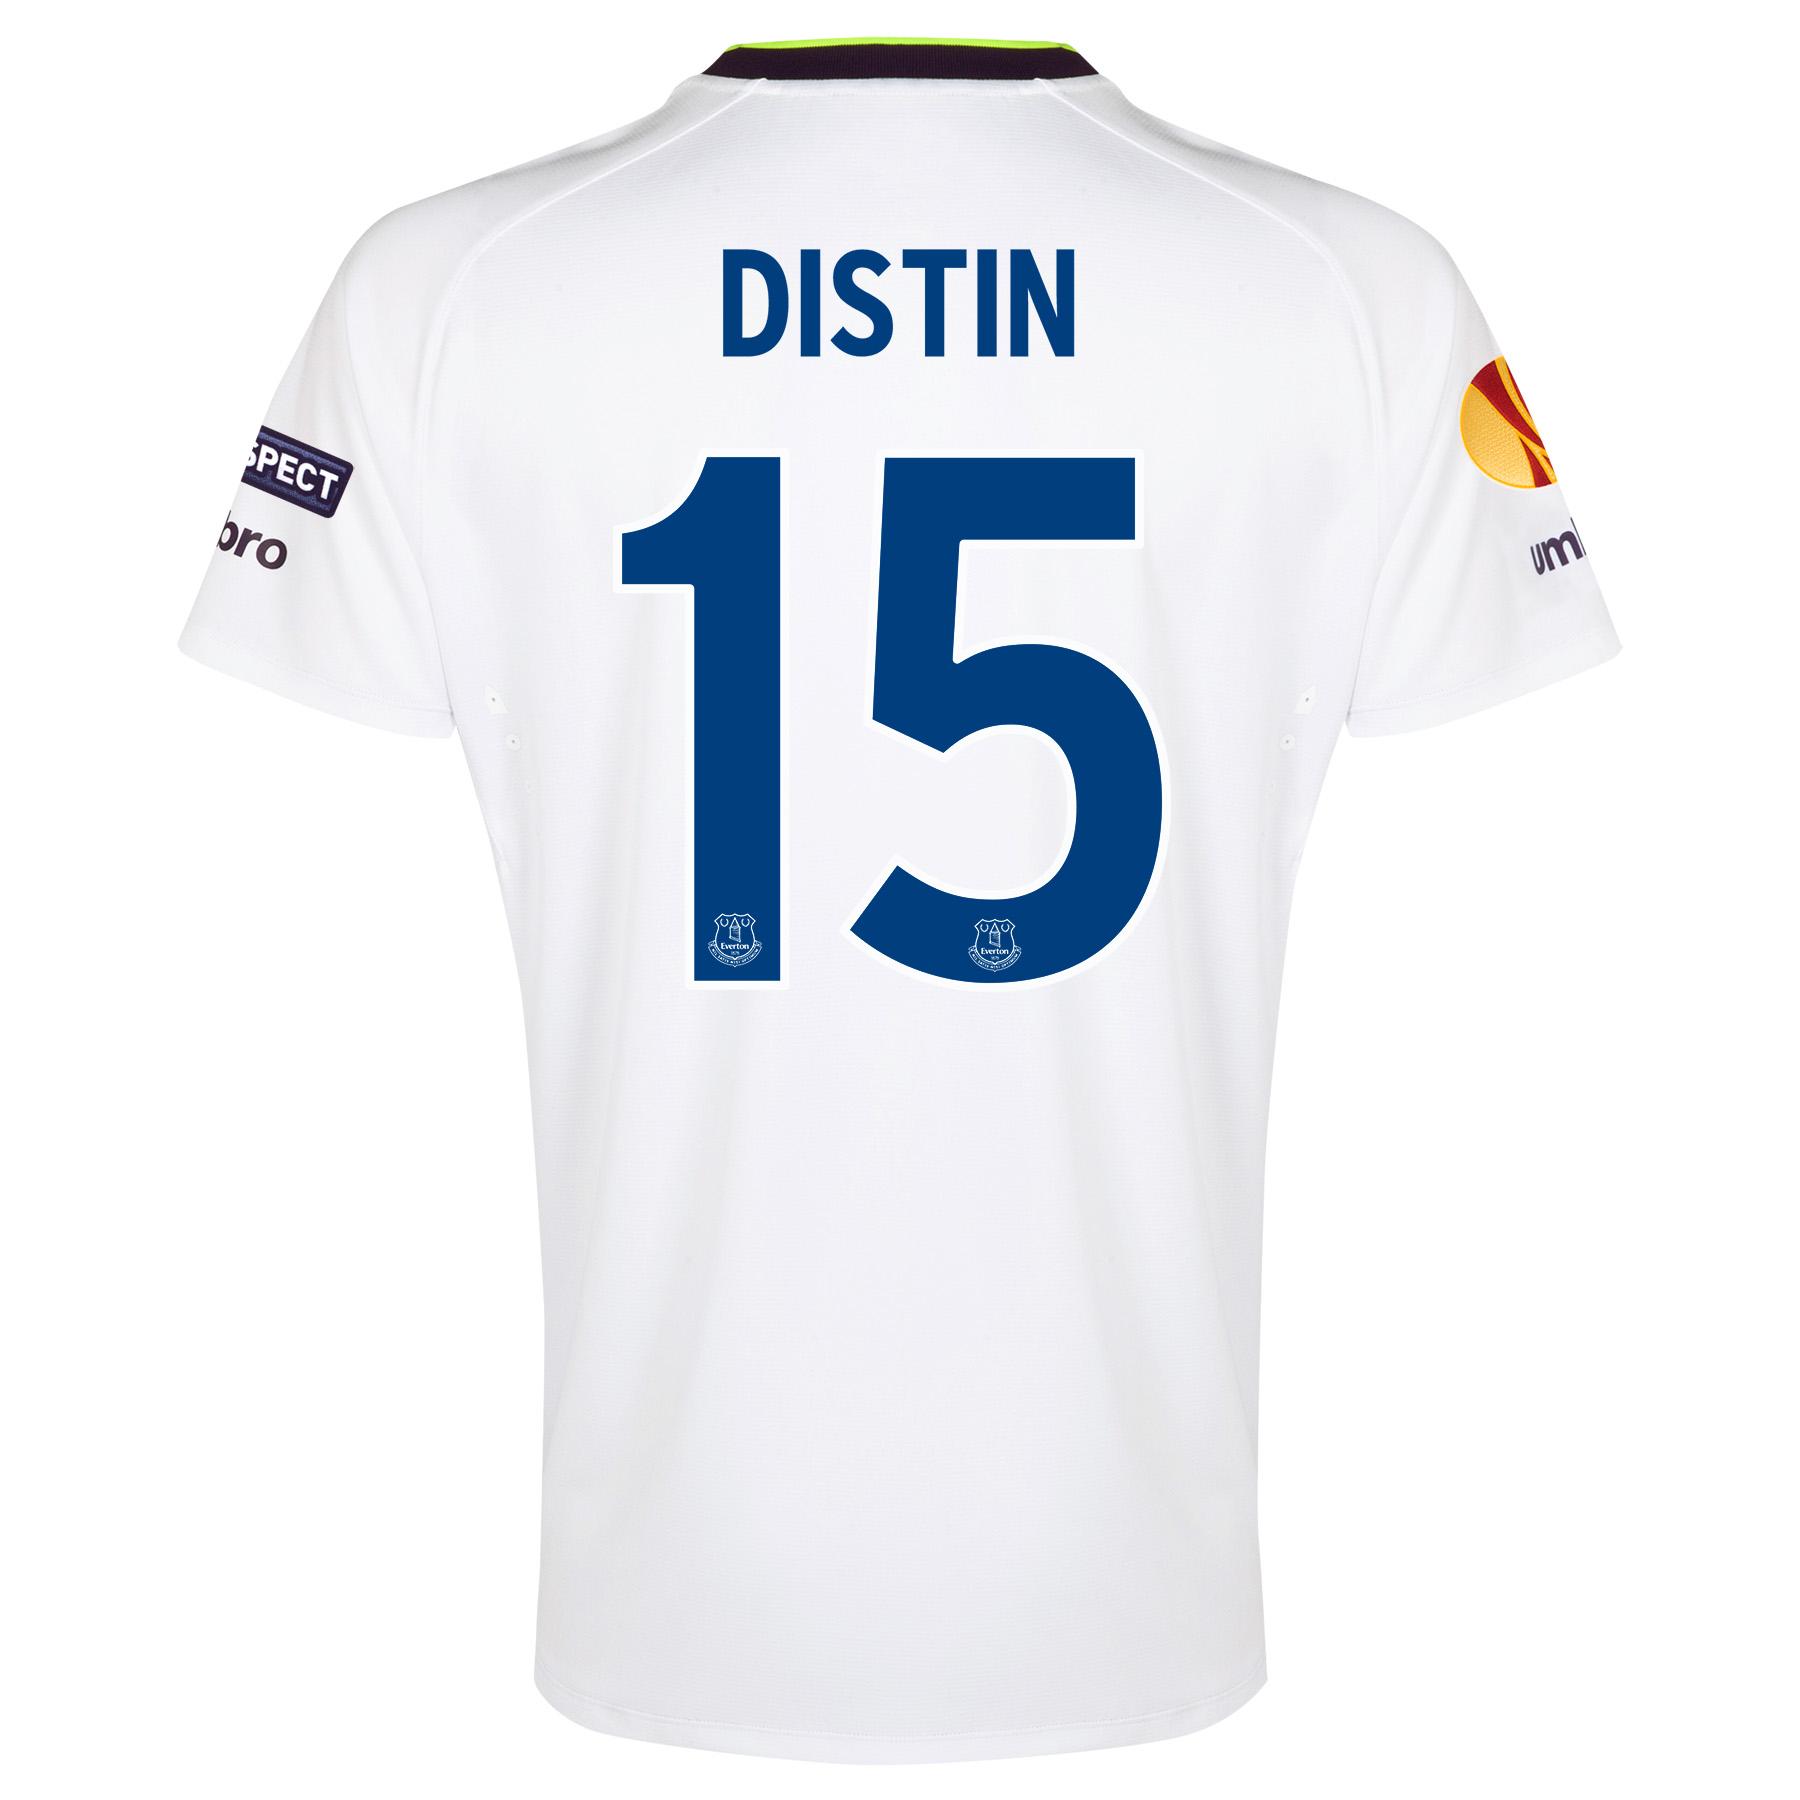 Everton UEFA Europa League 3rd Shirt 2014/15 with Distin 15 printing